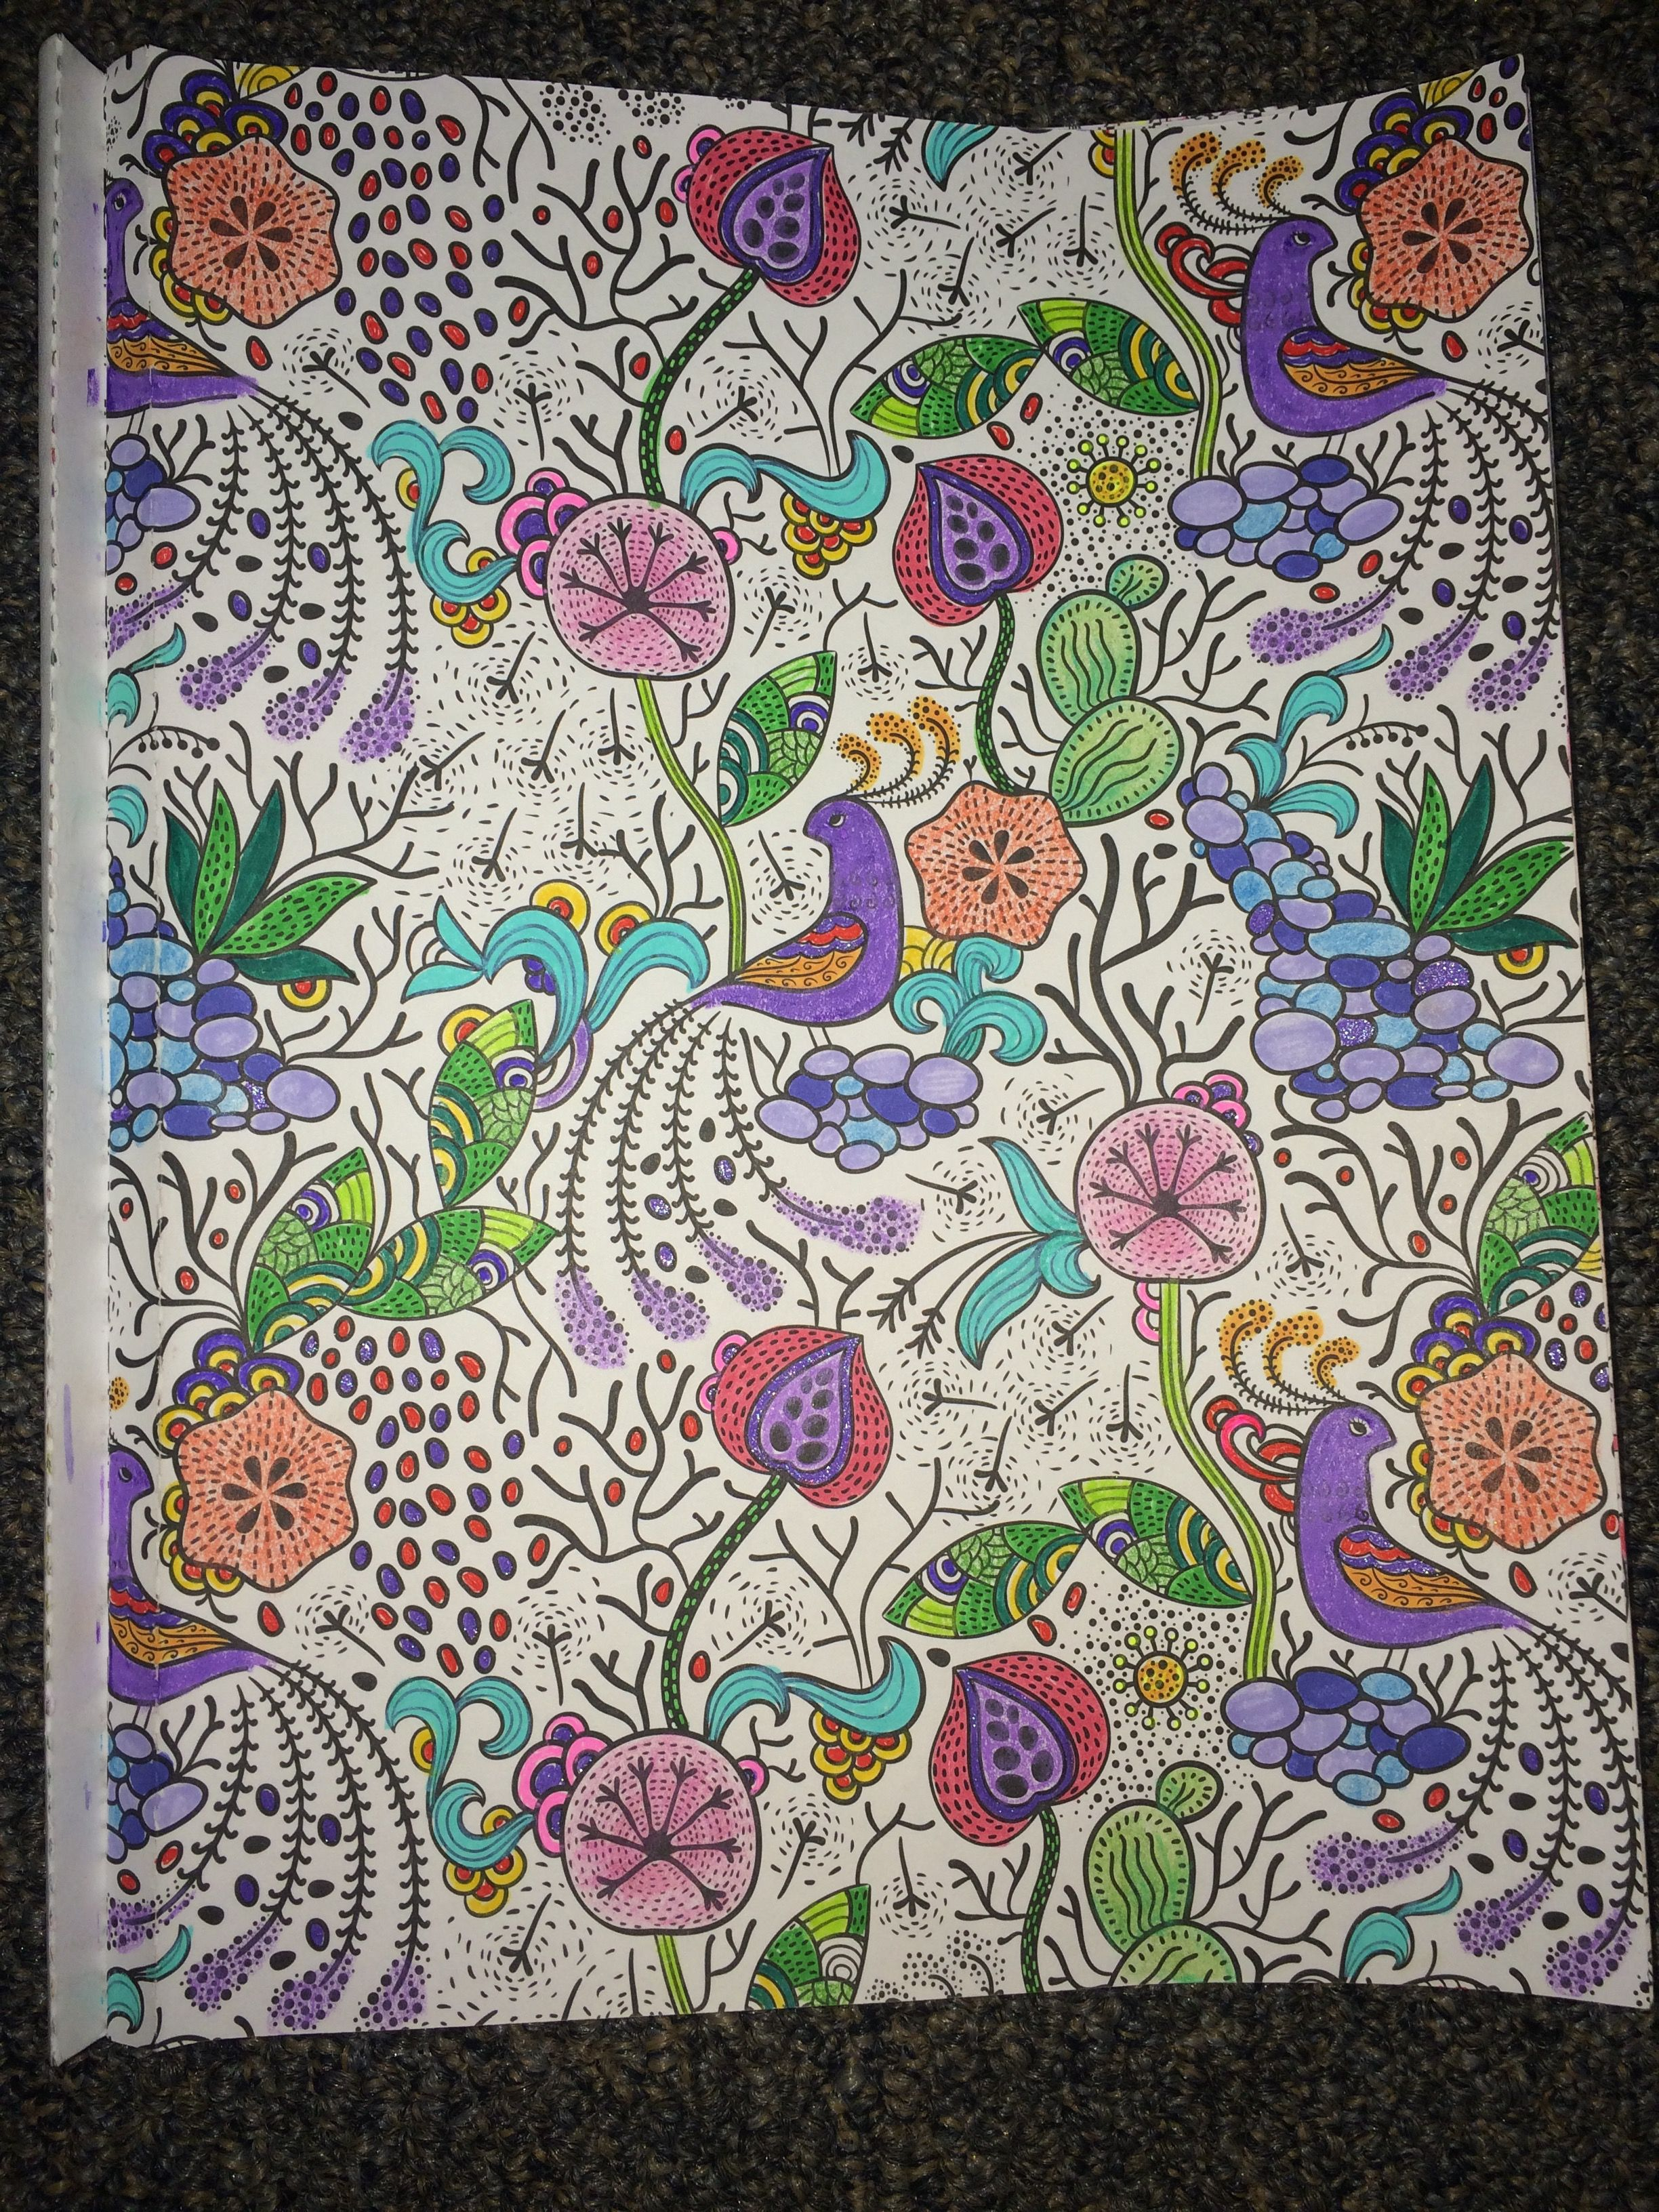 Color art mandala wonders - Adult Coloring From Color Art For Everyone